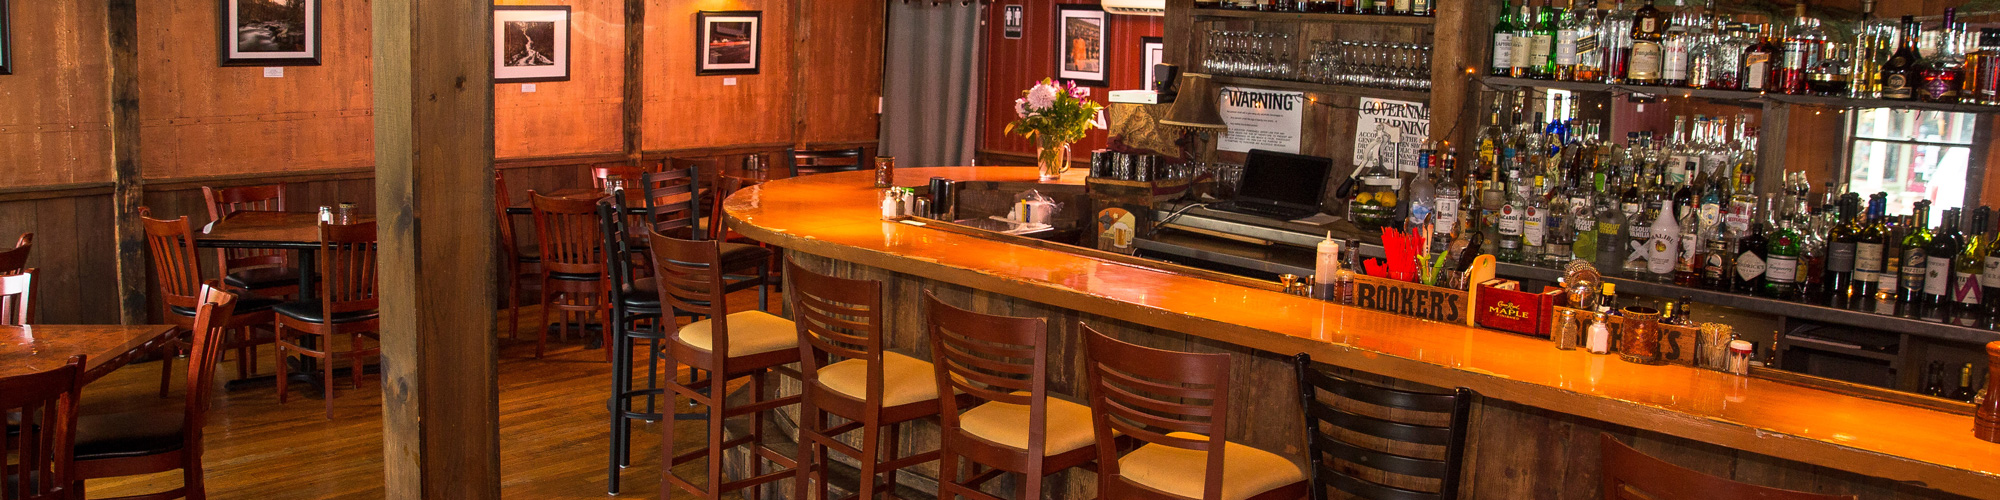 Chatham Grill Restaurant, Chatham, NY